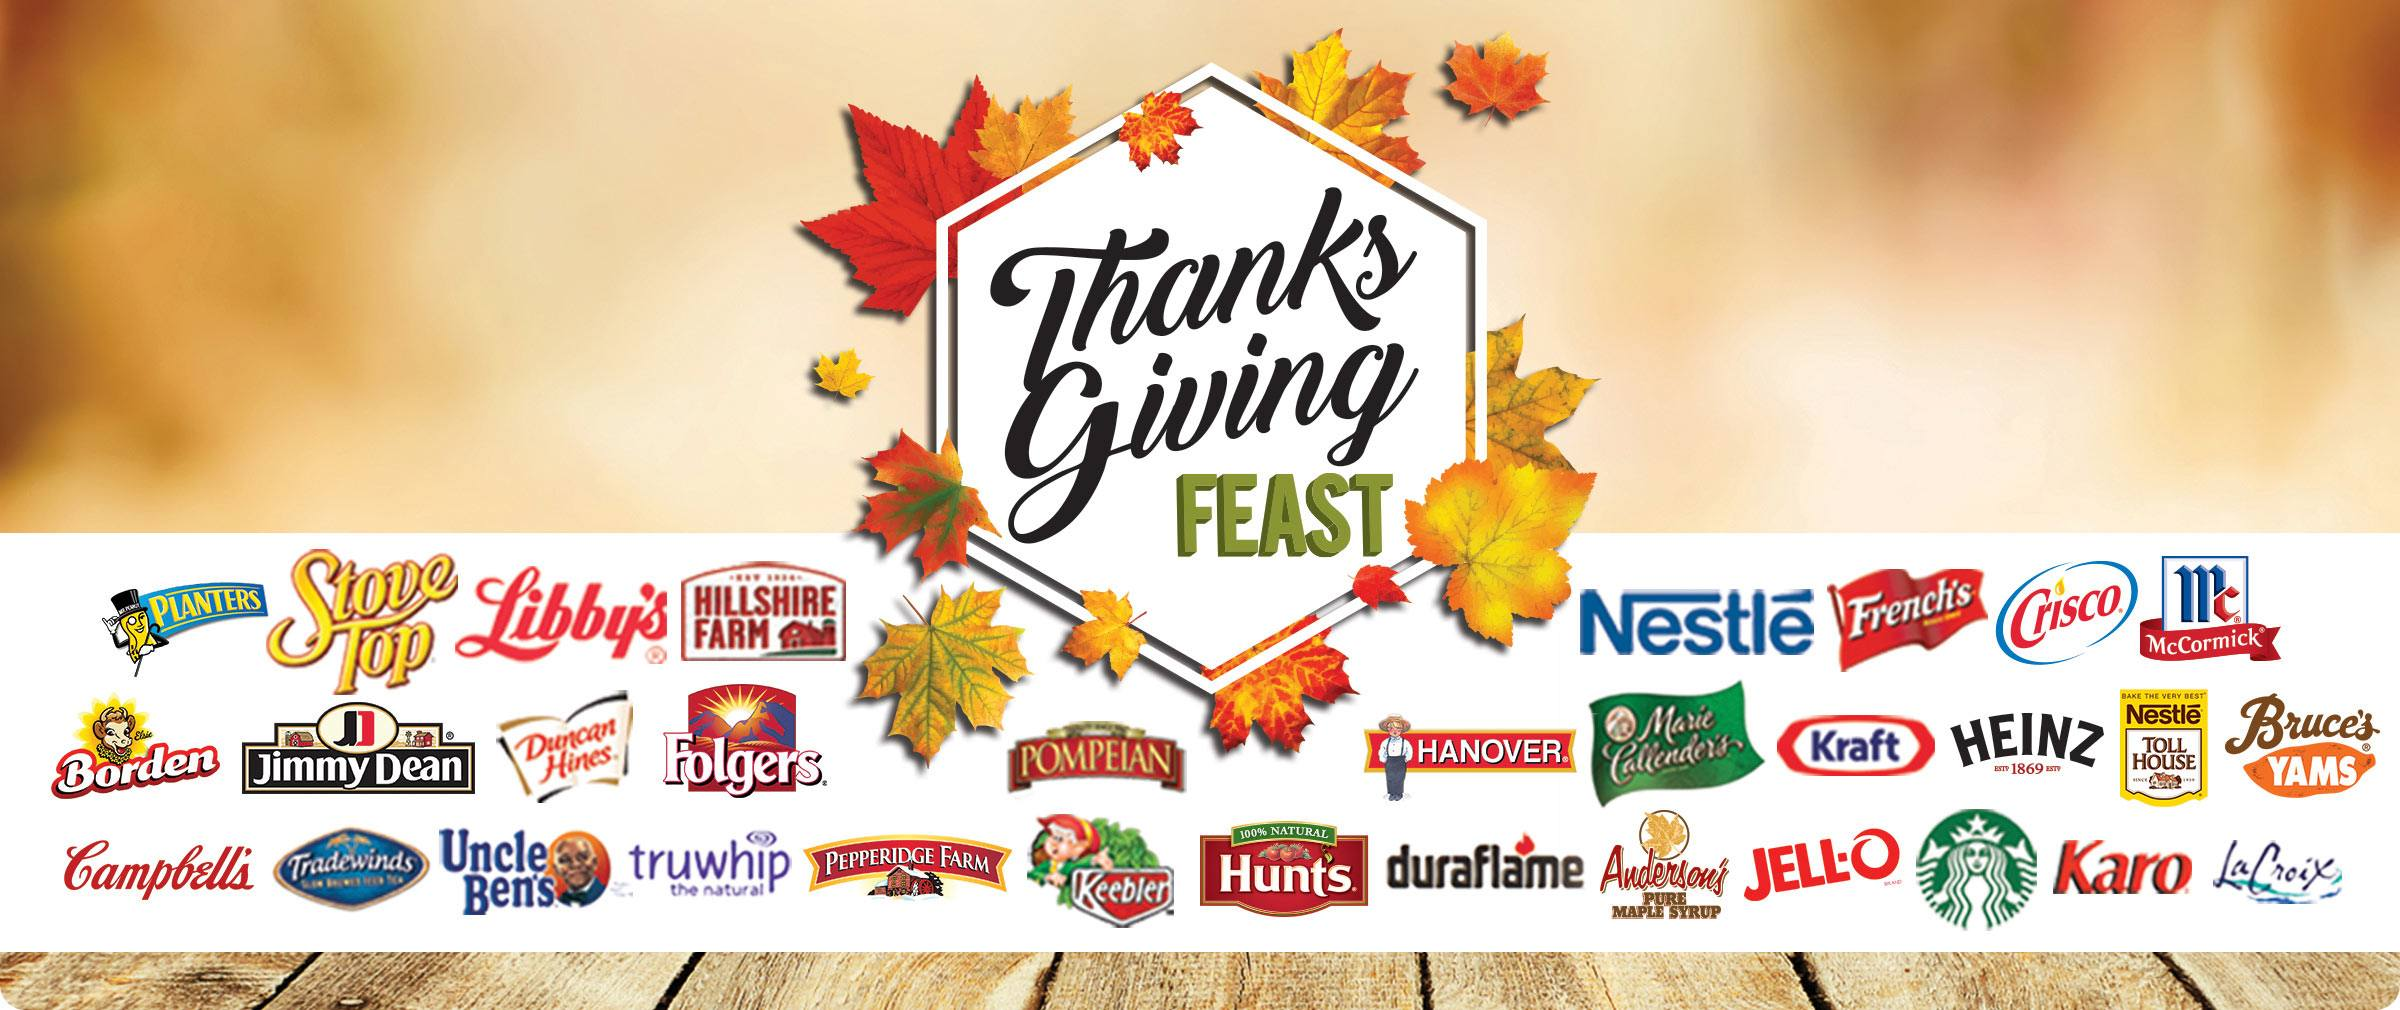 ThanksgivingGlider_Generic-JSF